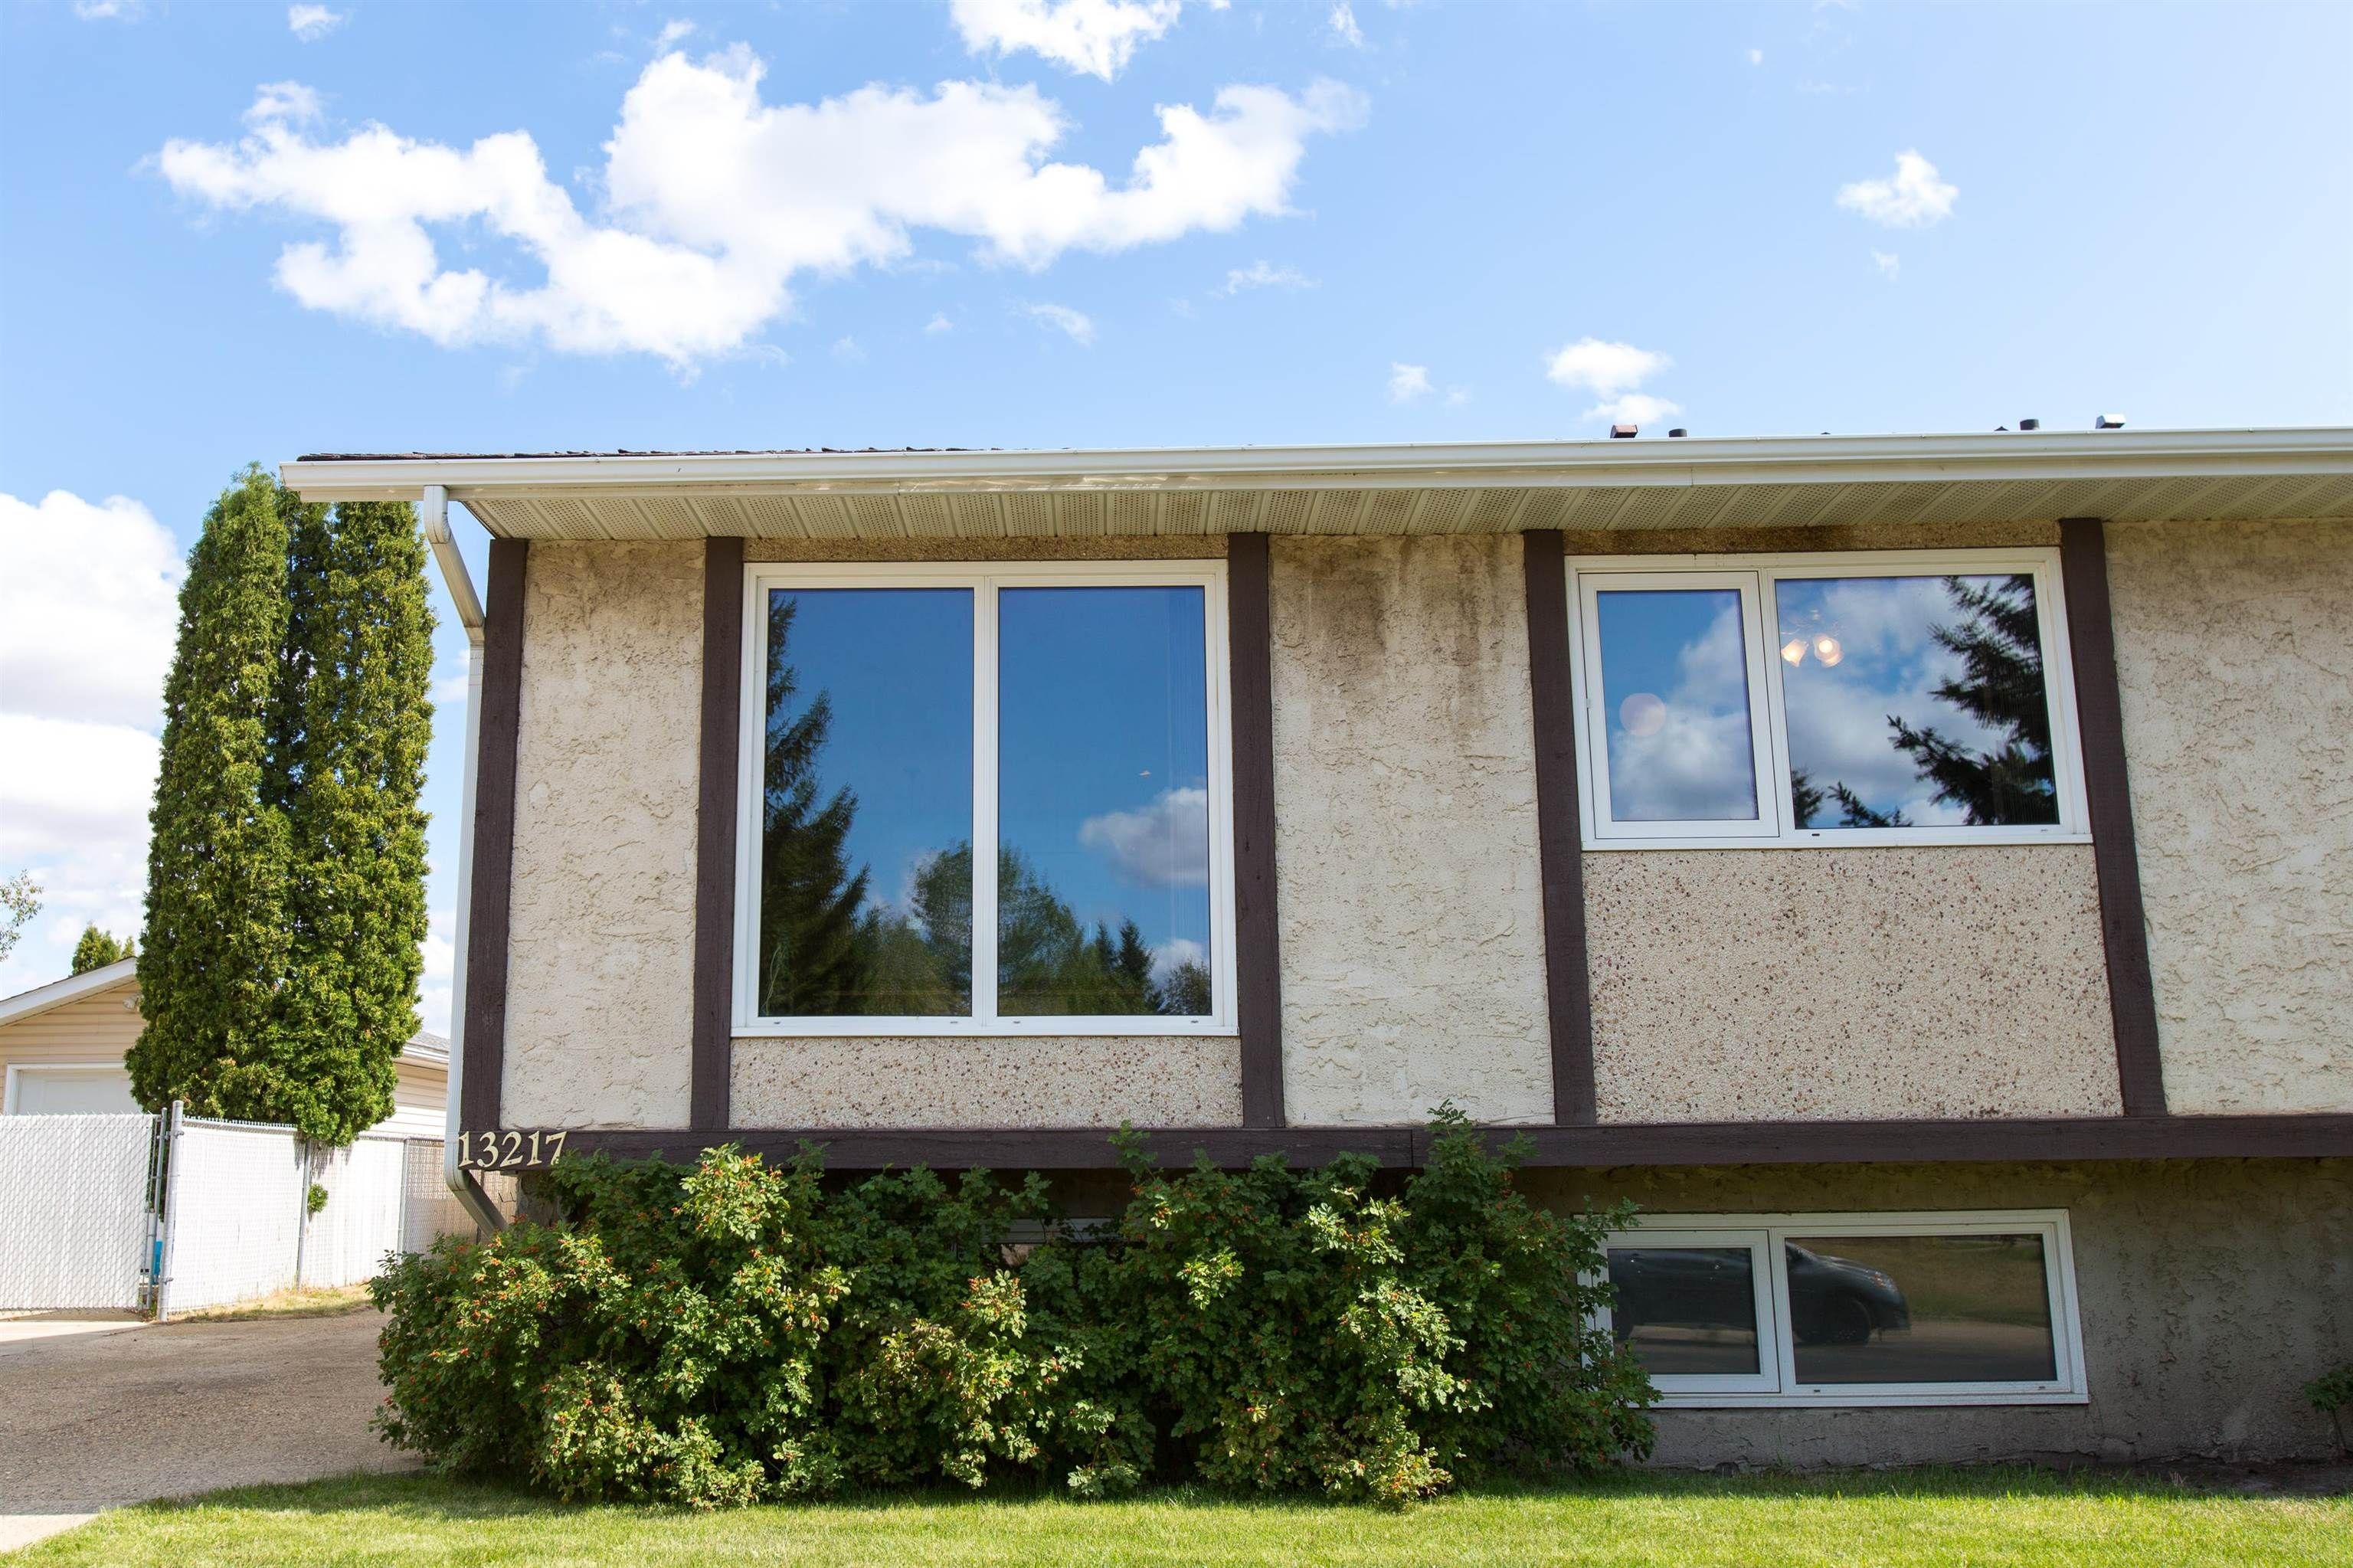 Main Photo: 13217 39A Street in Edmonton: Zone 35 House Half Duplex for sale : MLS®# E4262372